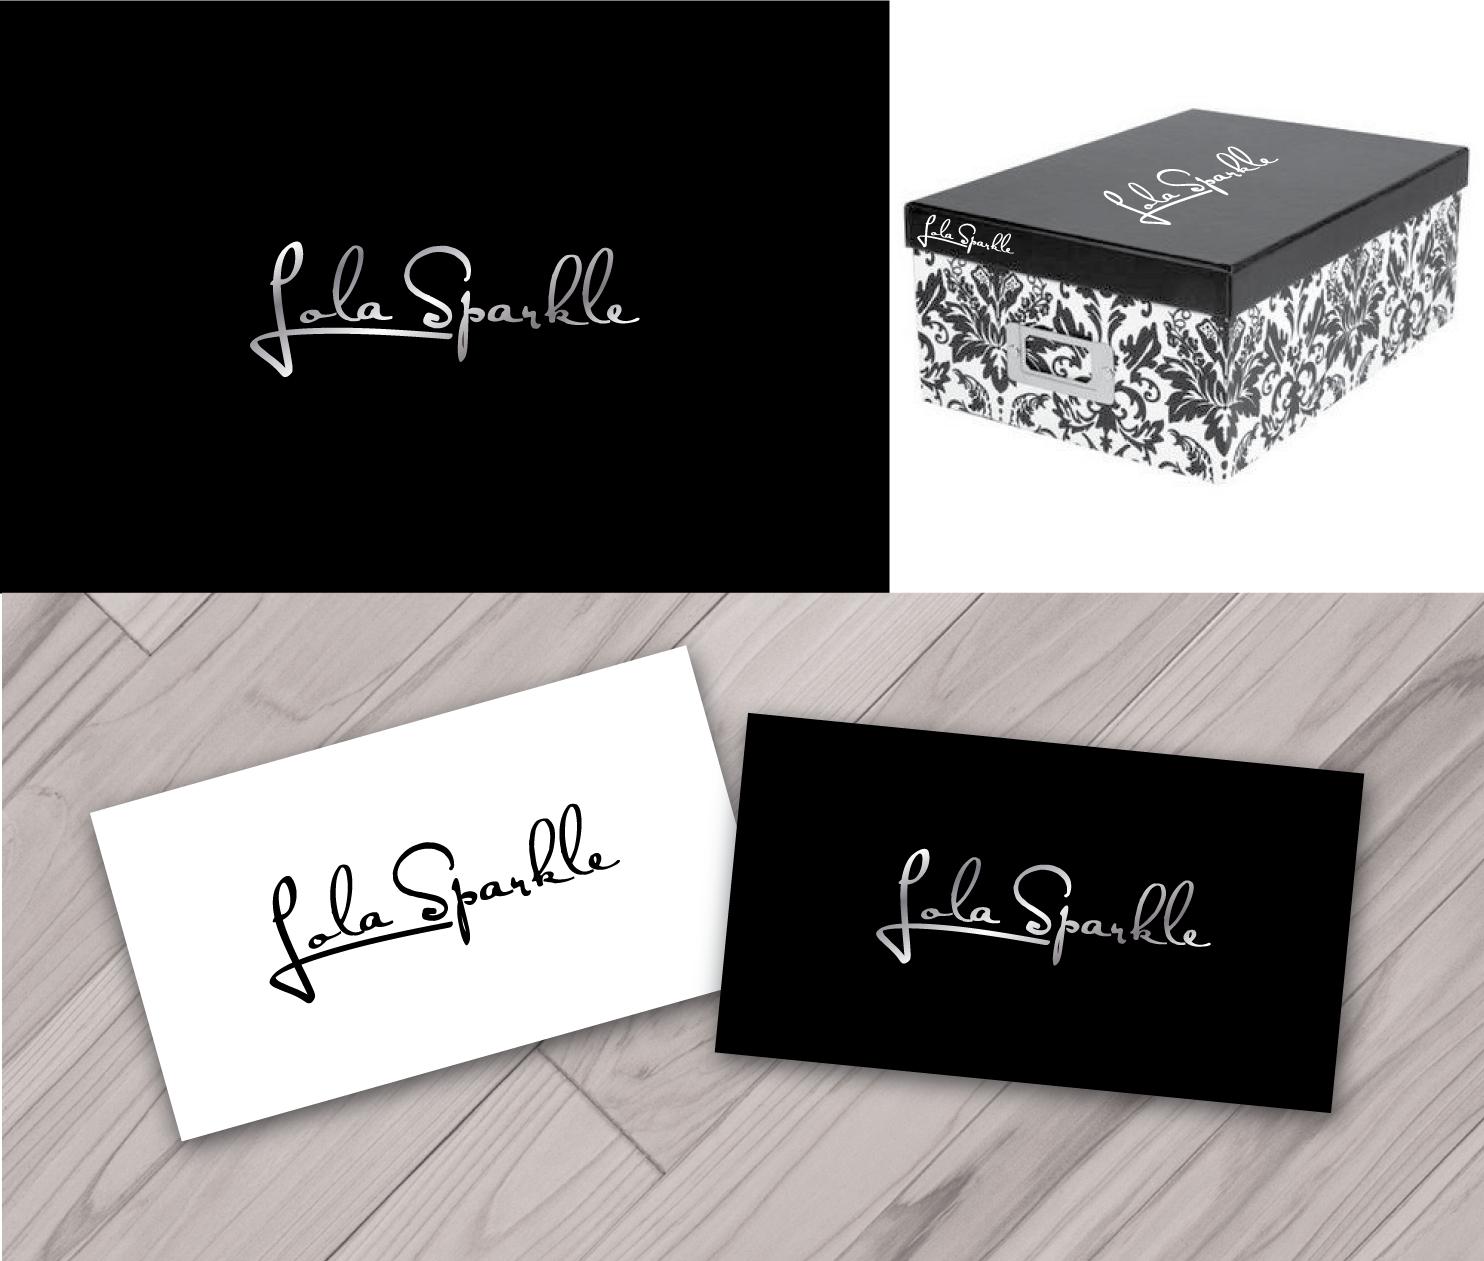 Lola Sparkle needs a new logo. Fun, fashion, current,